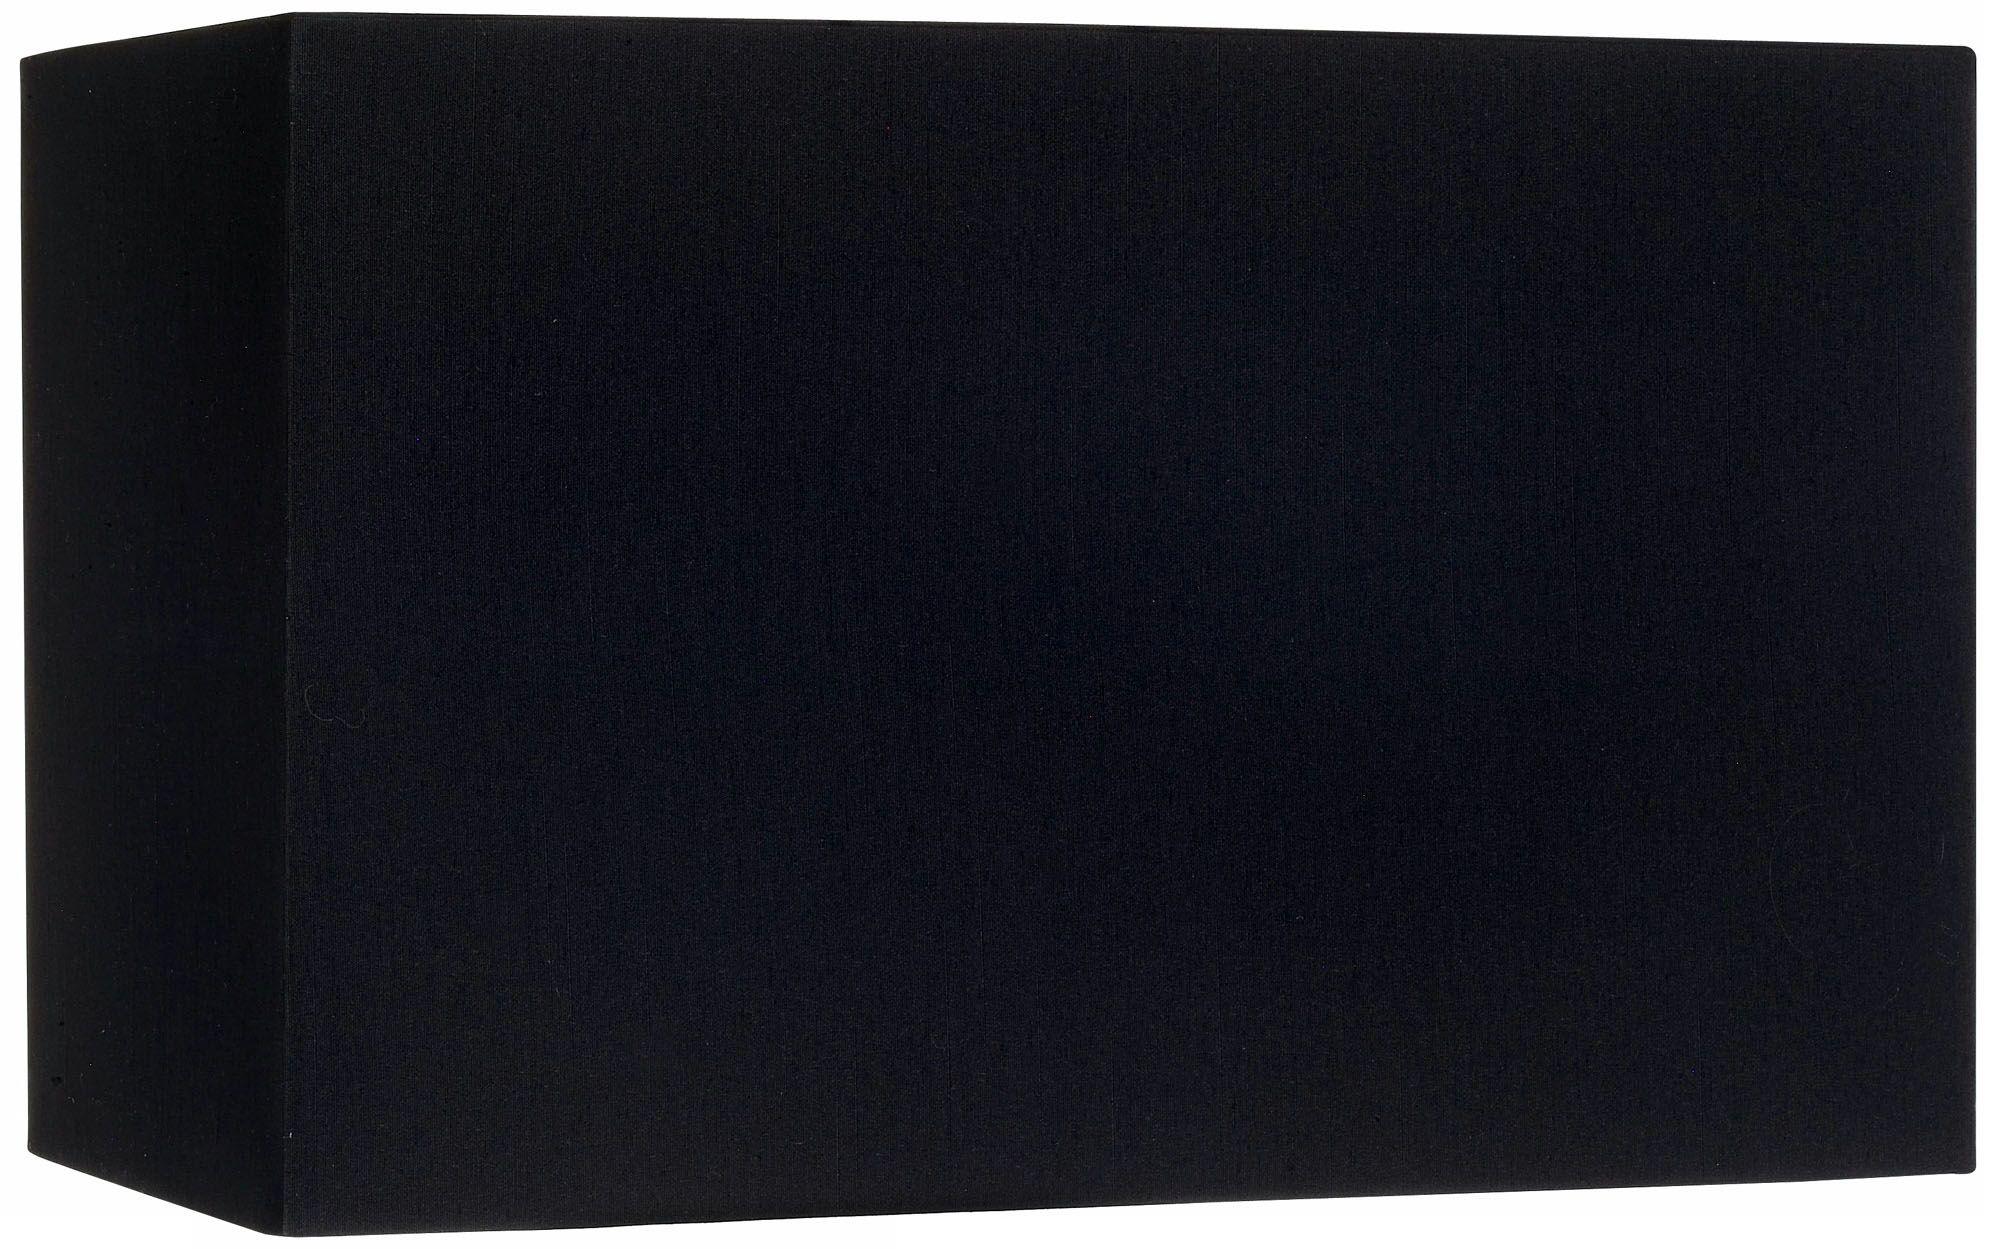 Black Rectangular Hardback Lamp Shade 8/16x8/16x10 (Spider)